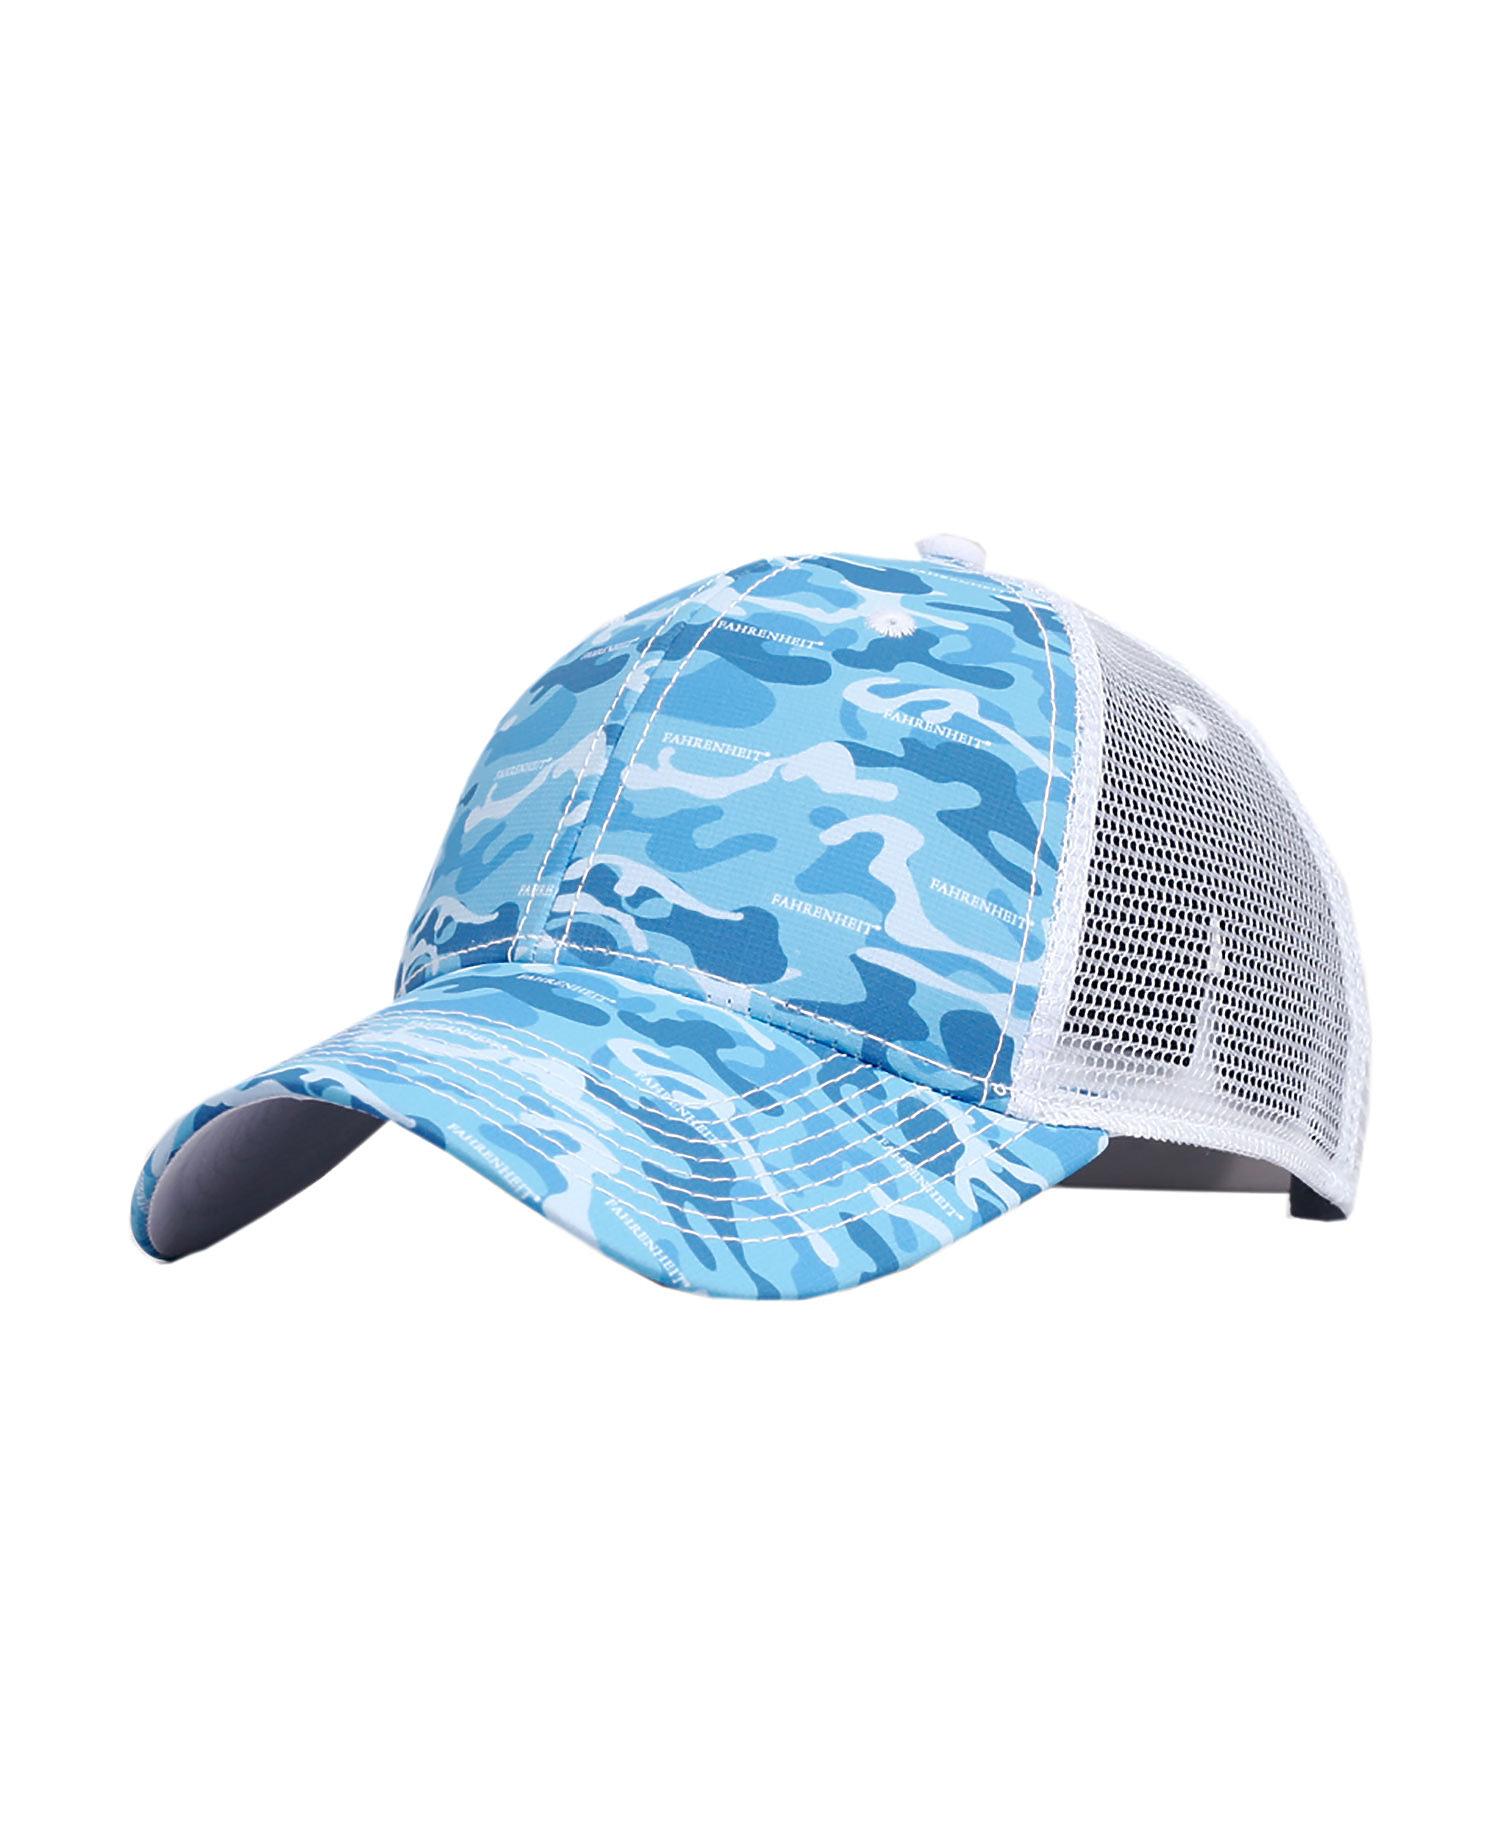 Fahrenheit F0820 - Lightweight Nylon Water Camo Cap